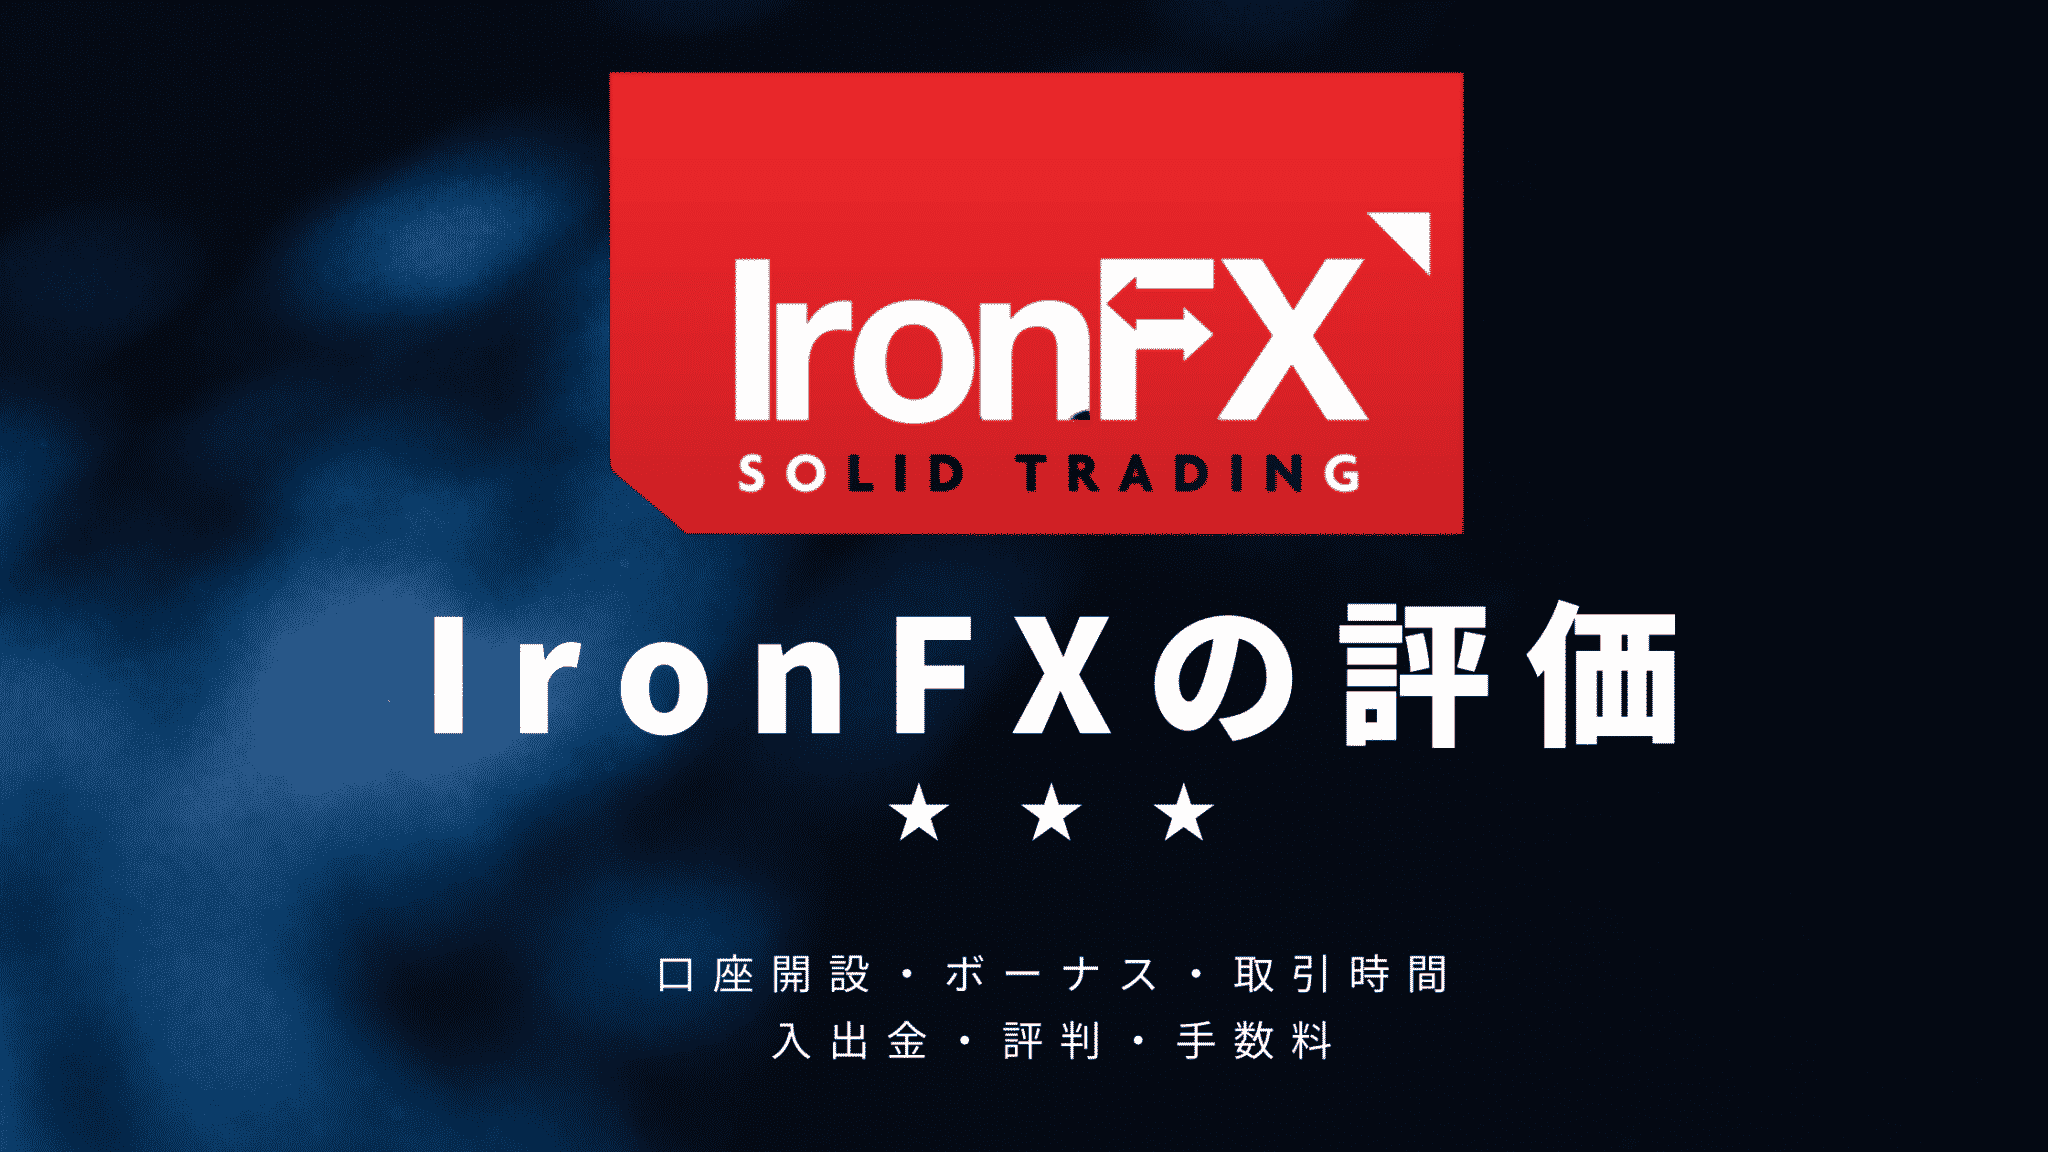 IronFXの評価 口座開設・ボーナス・取引時間・入出金・評判・手数料